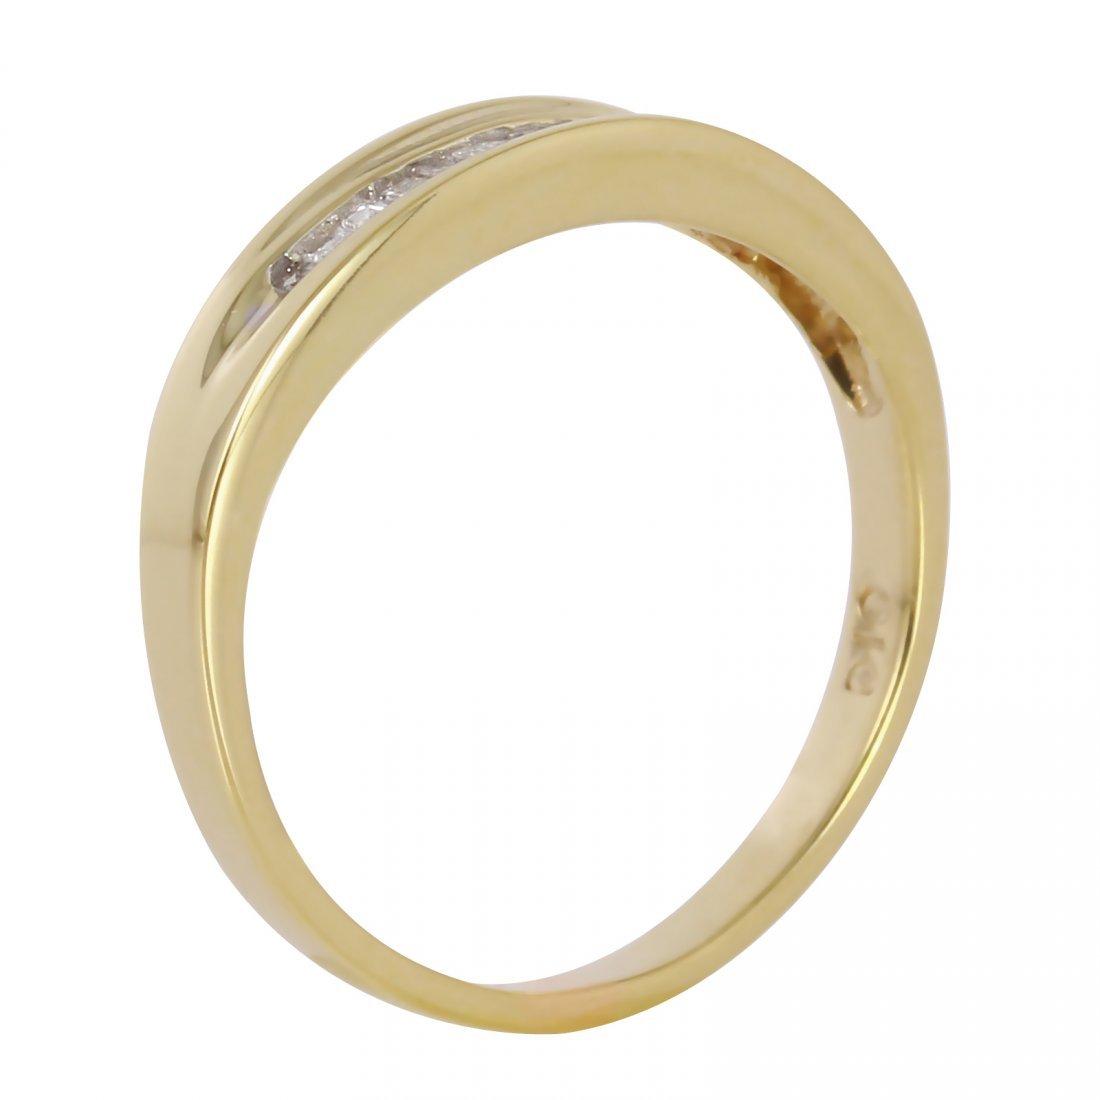 14K Yellow Gold Diamond Wedding Band, 0.25 ctw - 2